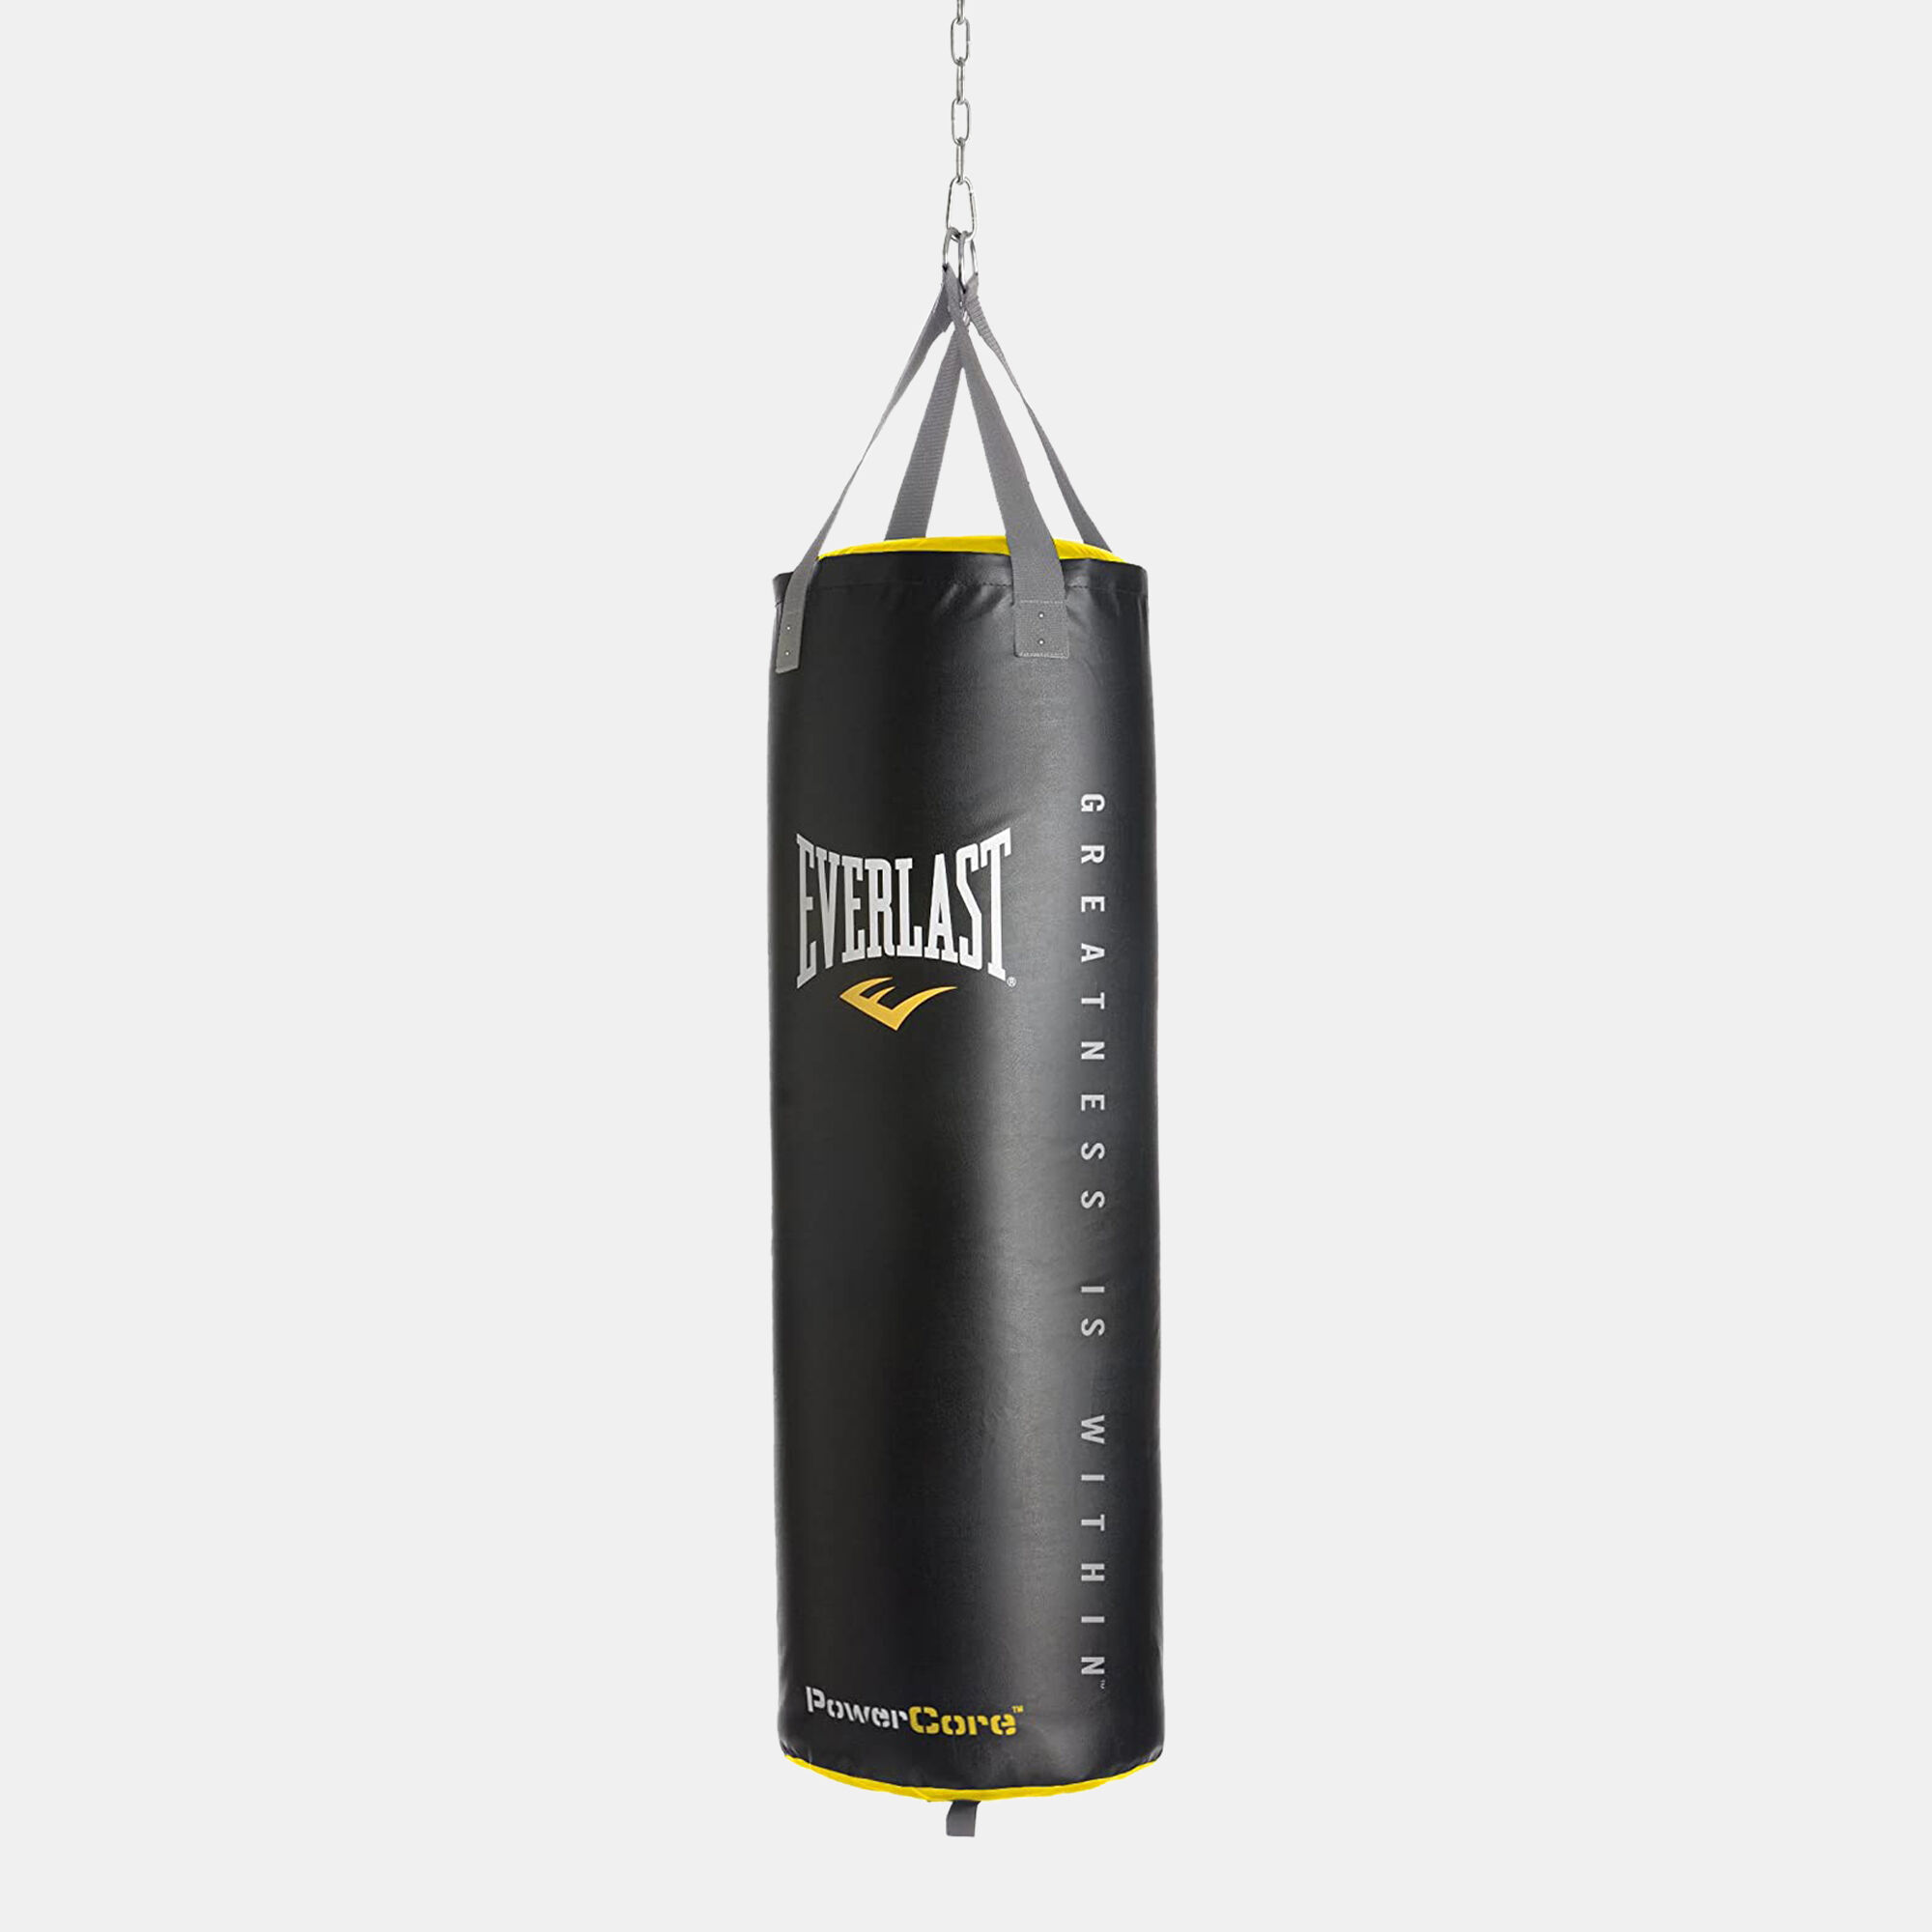 Buy Everlast Powercore Nevatear Heavy Punching Bag 80 Lbs In Dubai Uae Sss